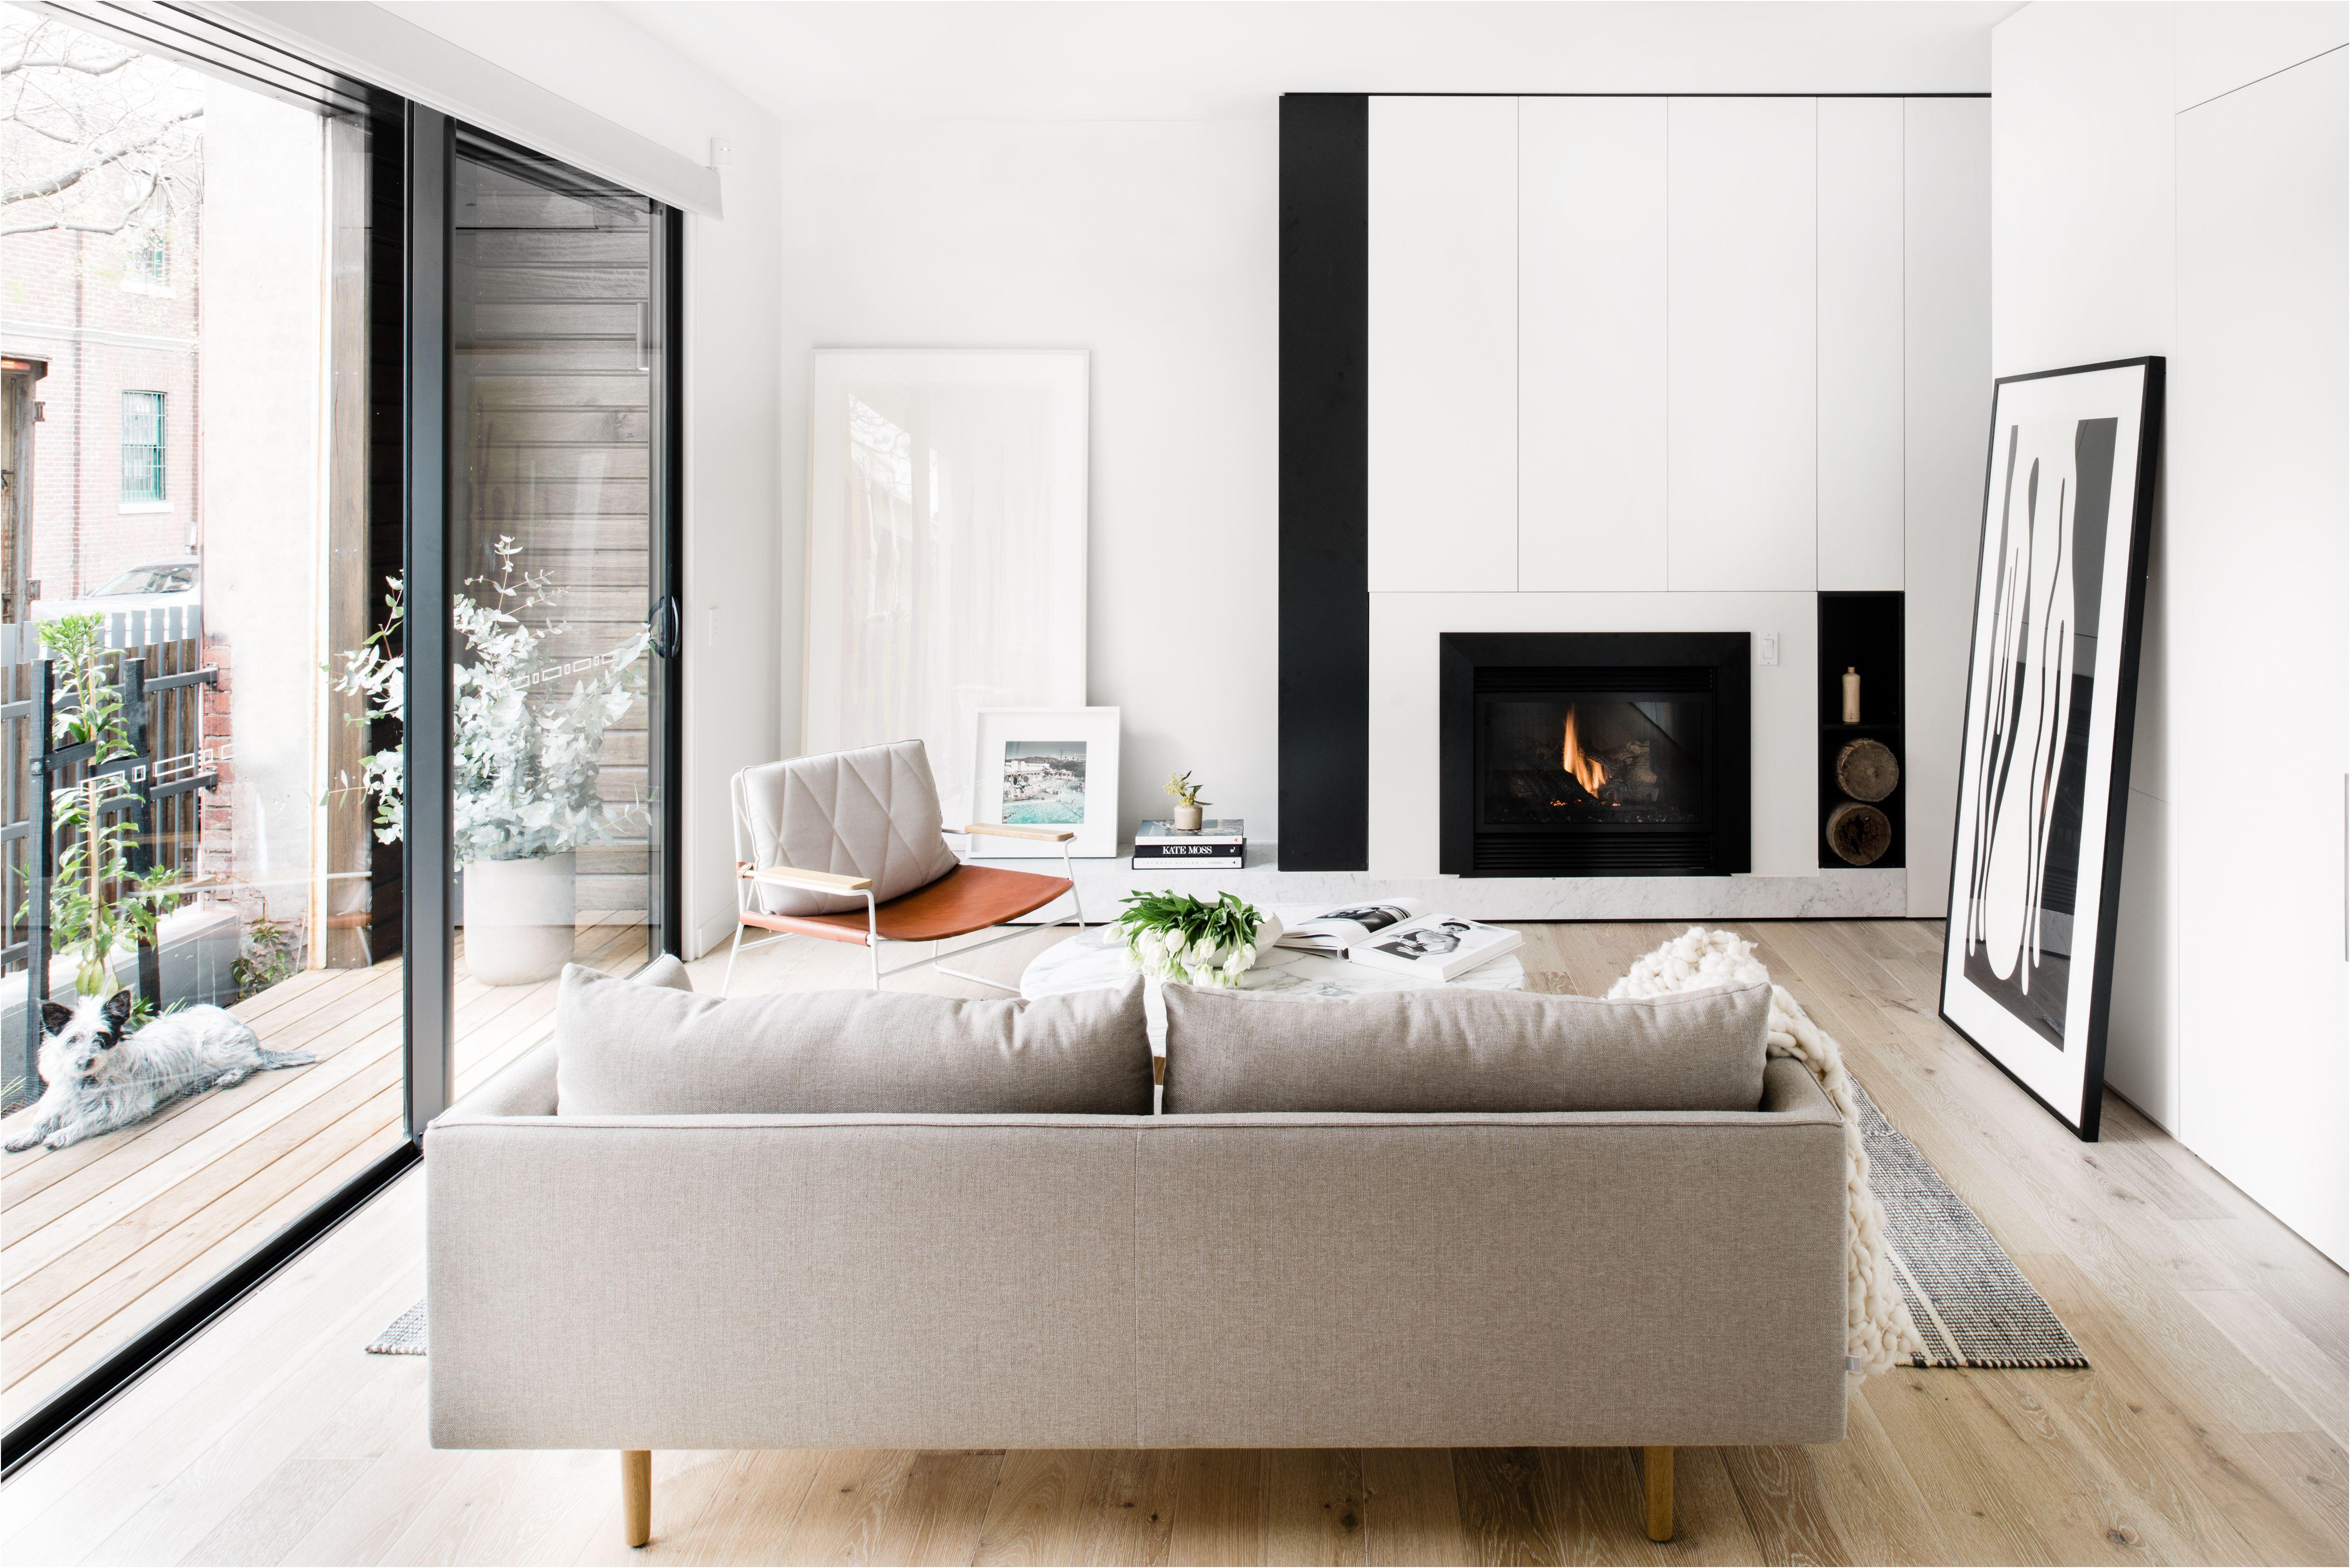 12 decalage attrayant lustre salon design pictures